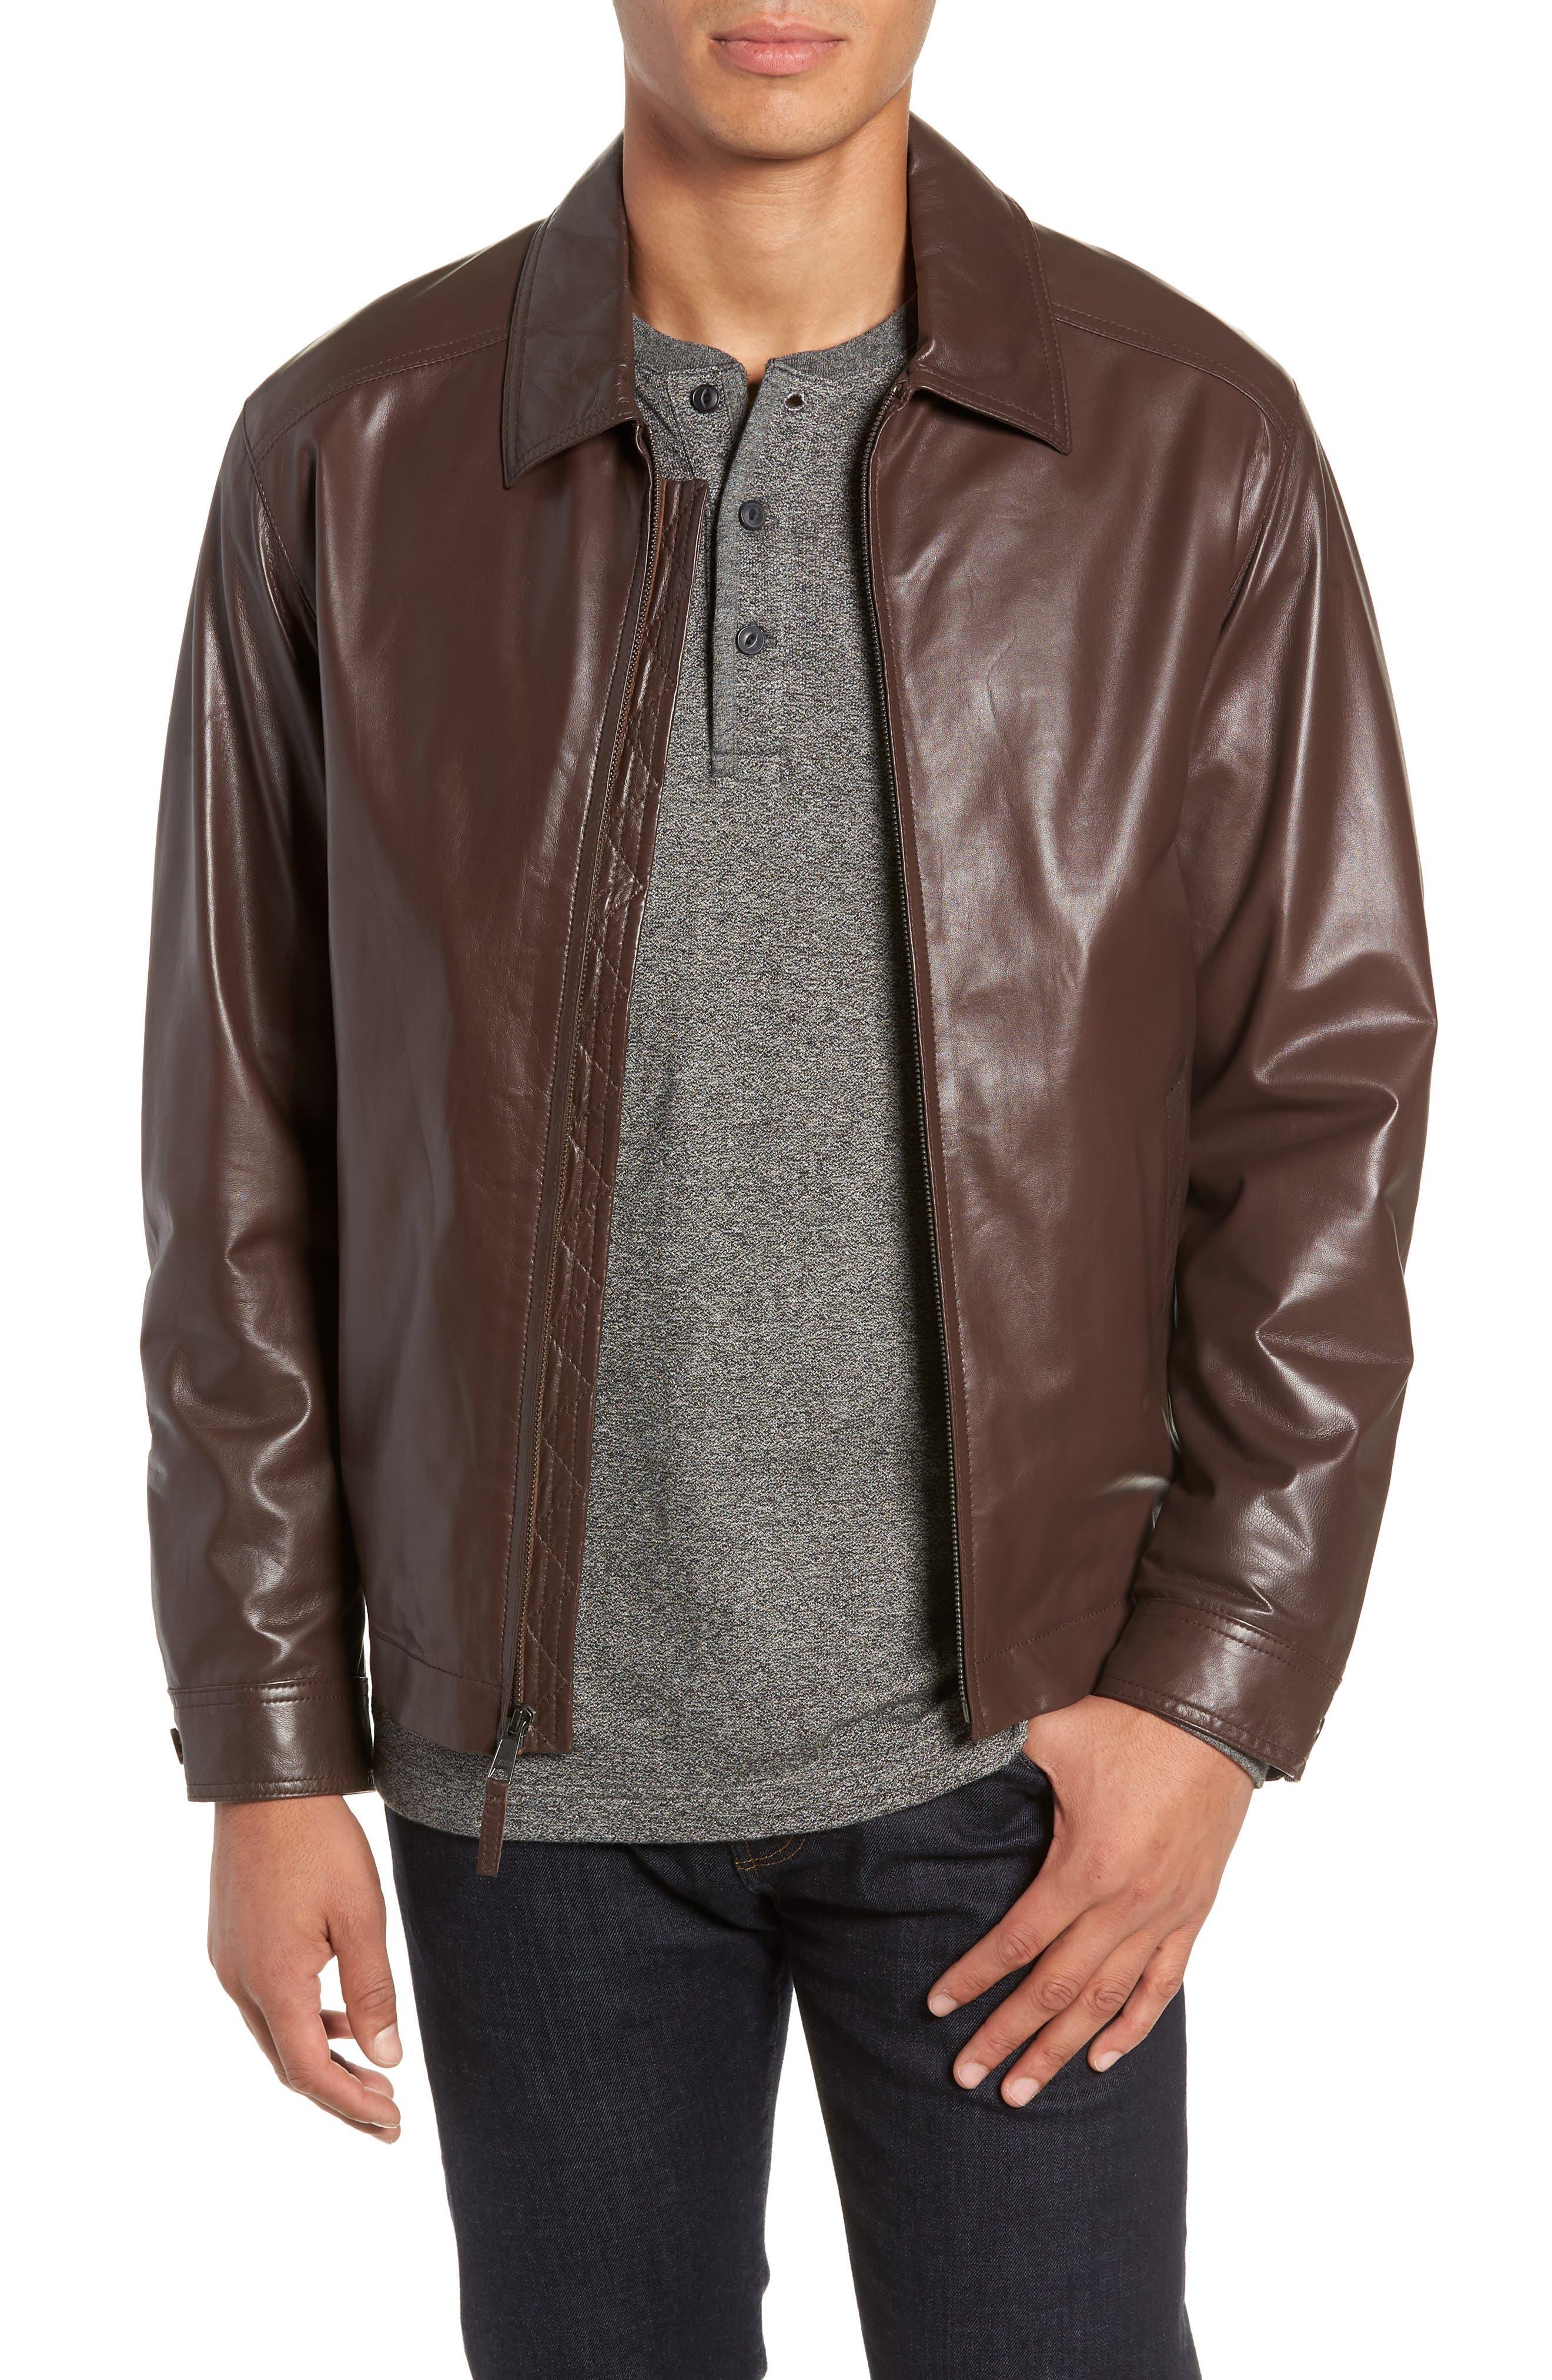 GOLDEN BEAR,                             The Bartlett Leather Jacket,                             Main thumbnail 1, color,                             DARK BROWN